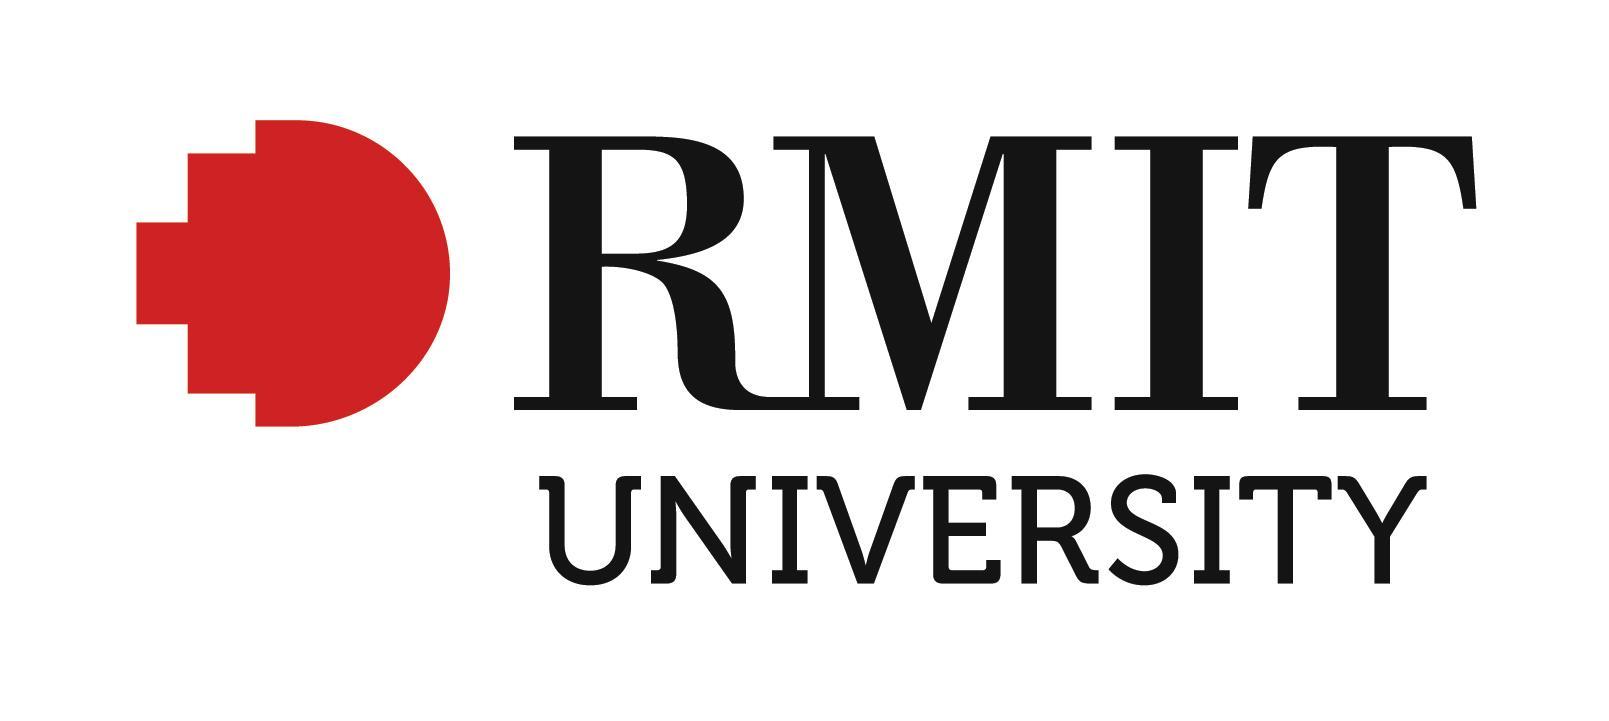 rmit university, seminario Christopher Cheong